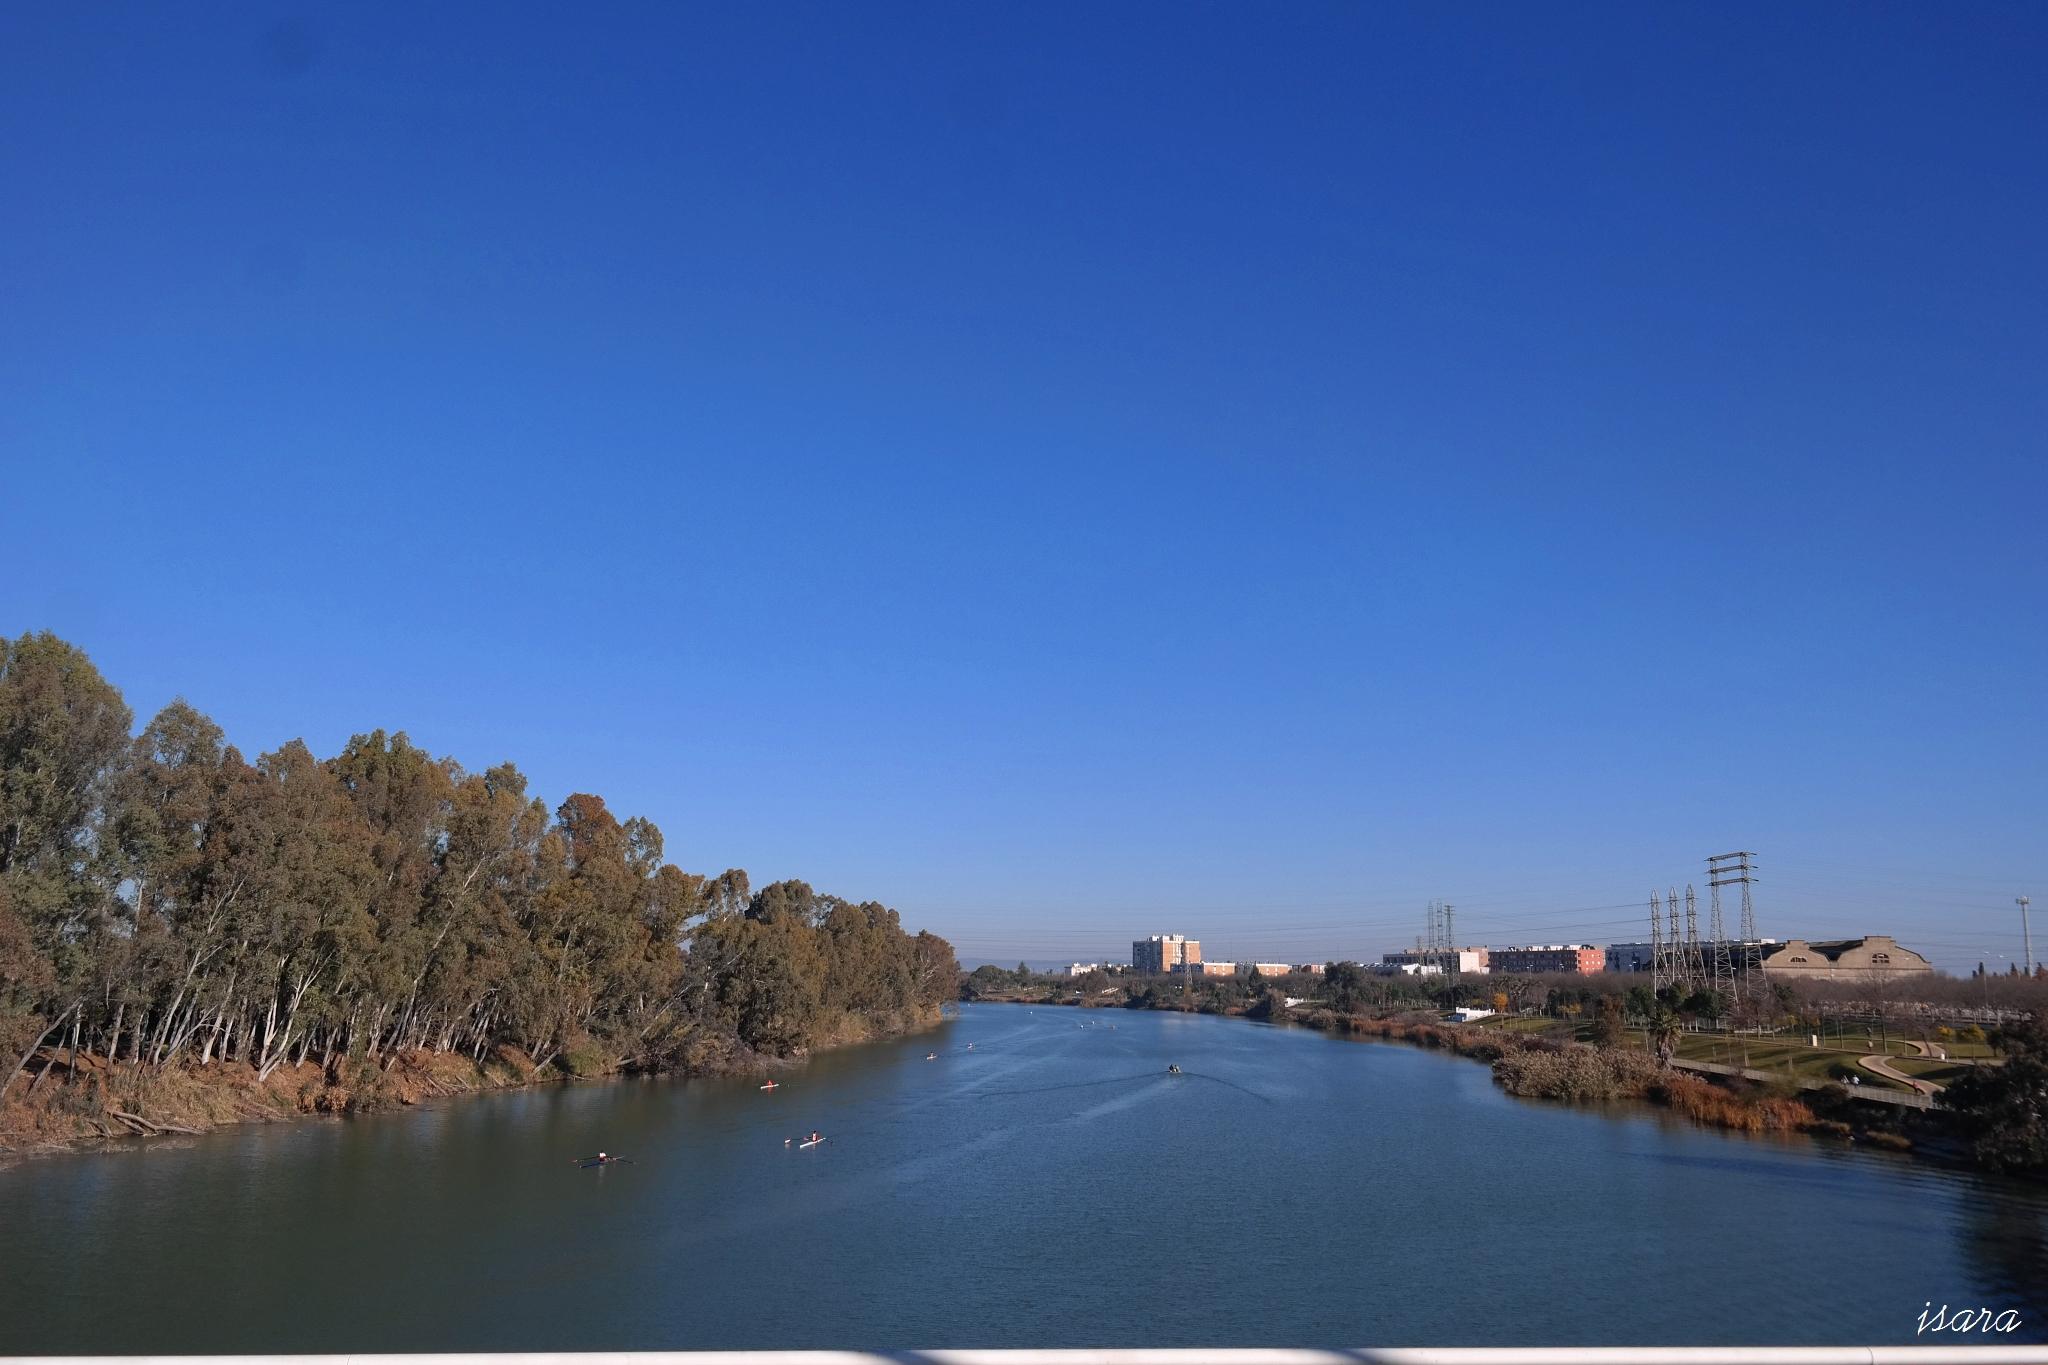 131222) Spain 아홉째날 in Sevilla